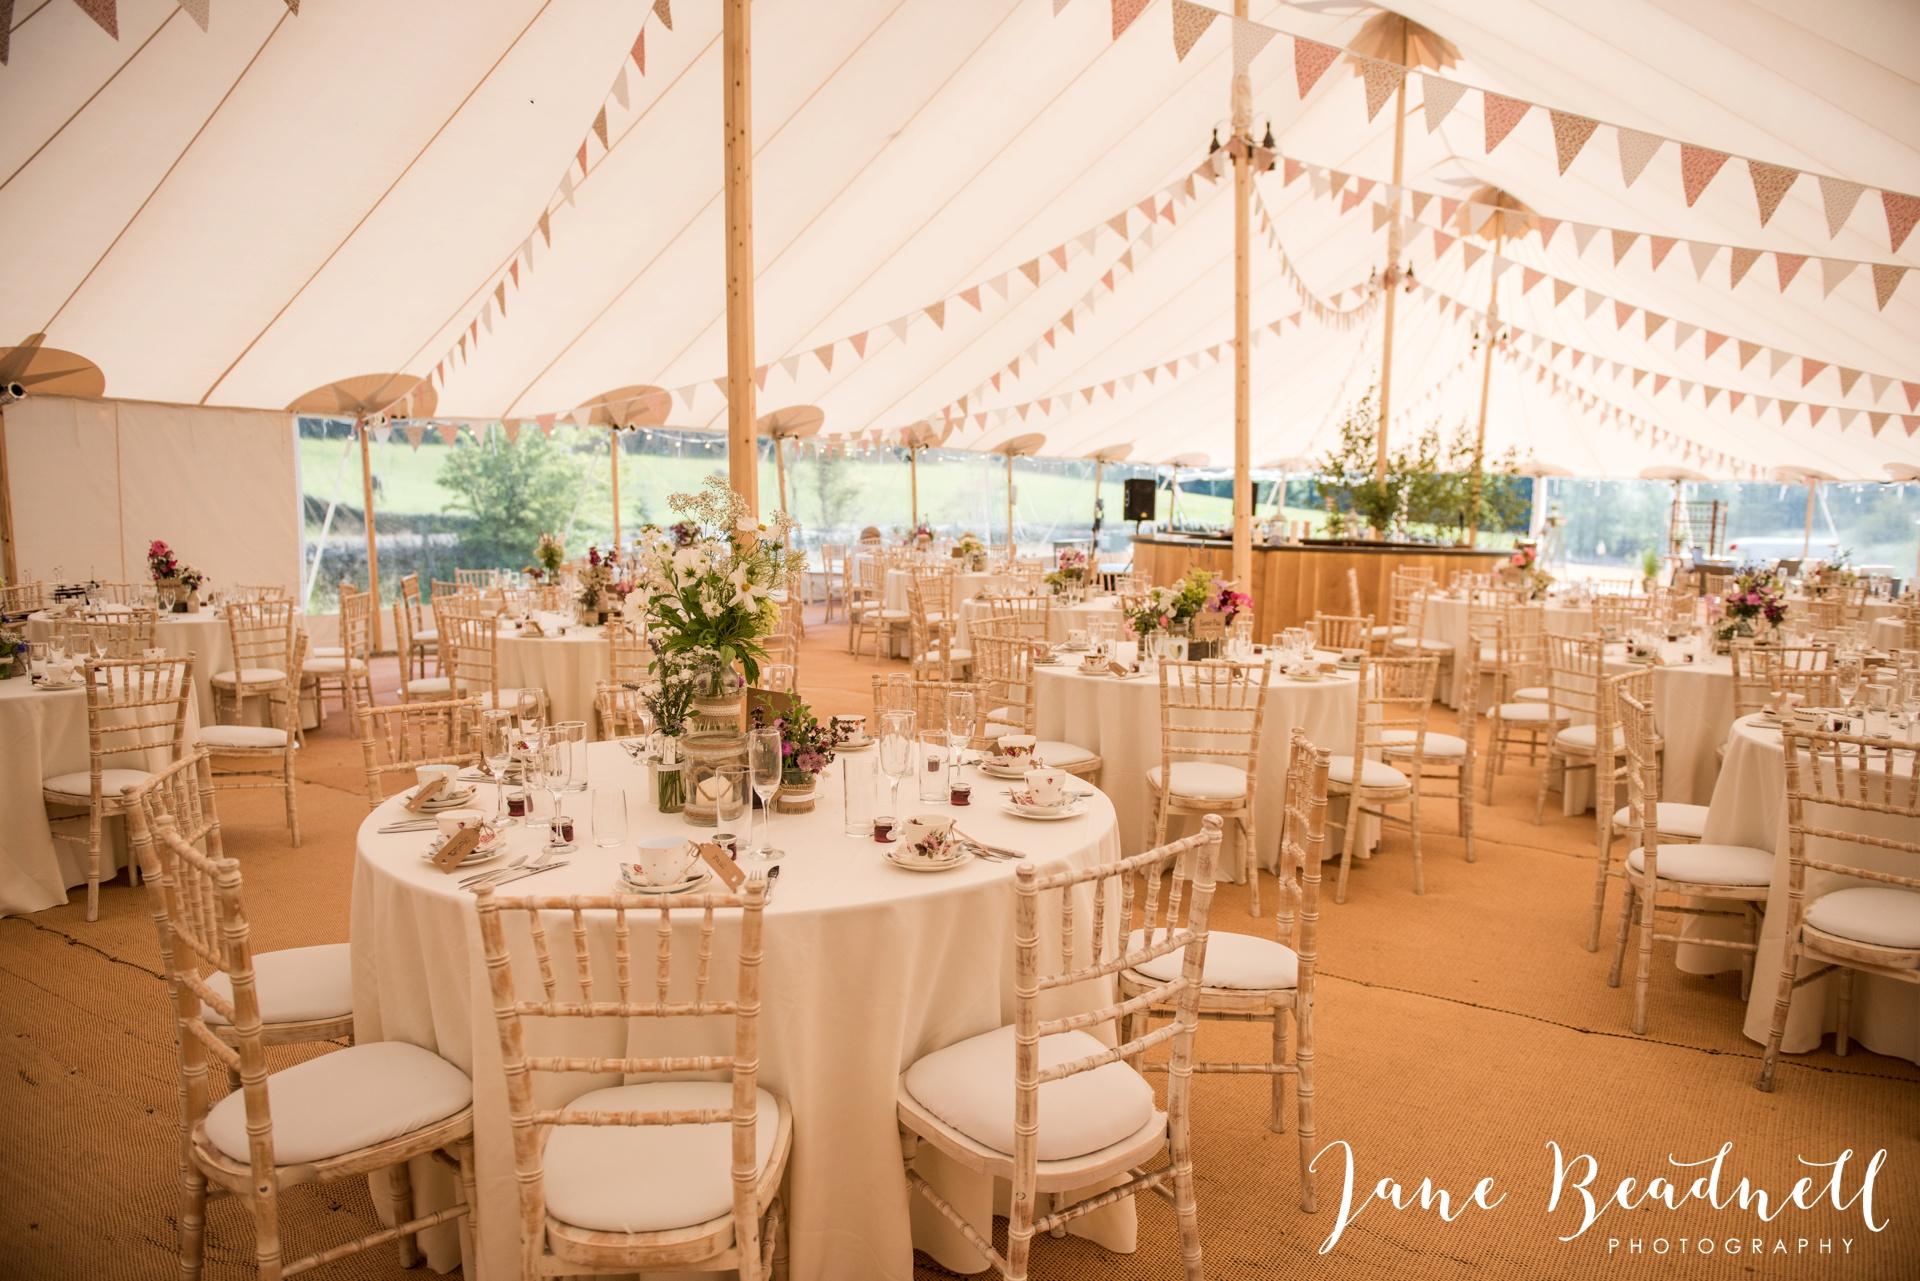 Jane Beadnell fine art wedding photographer Sperry Tent wedding Ilkley_0007 & Sperry Tent Wedding Ilkley - Jane Beadnell Photography